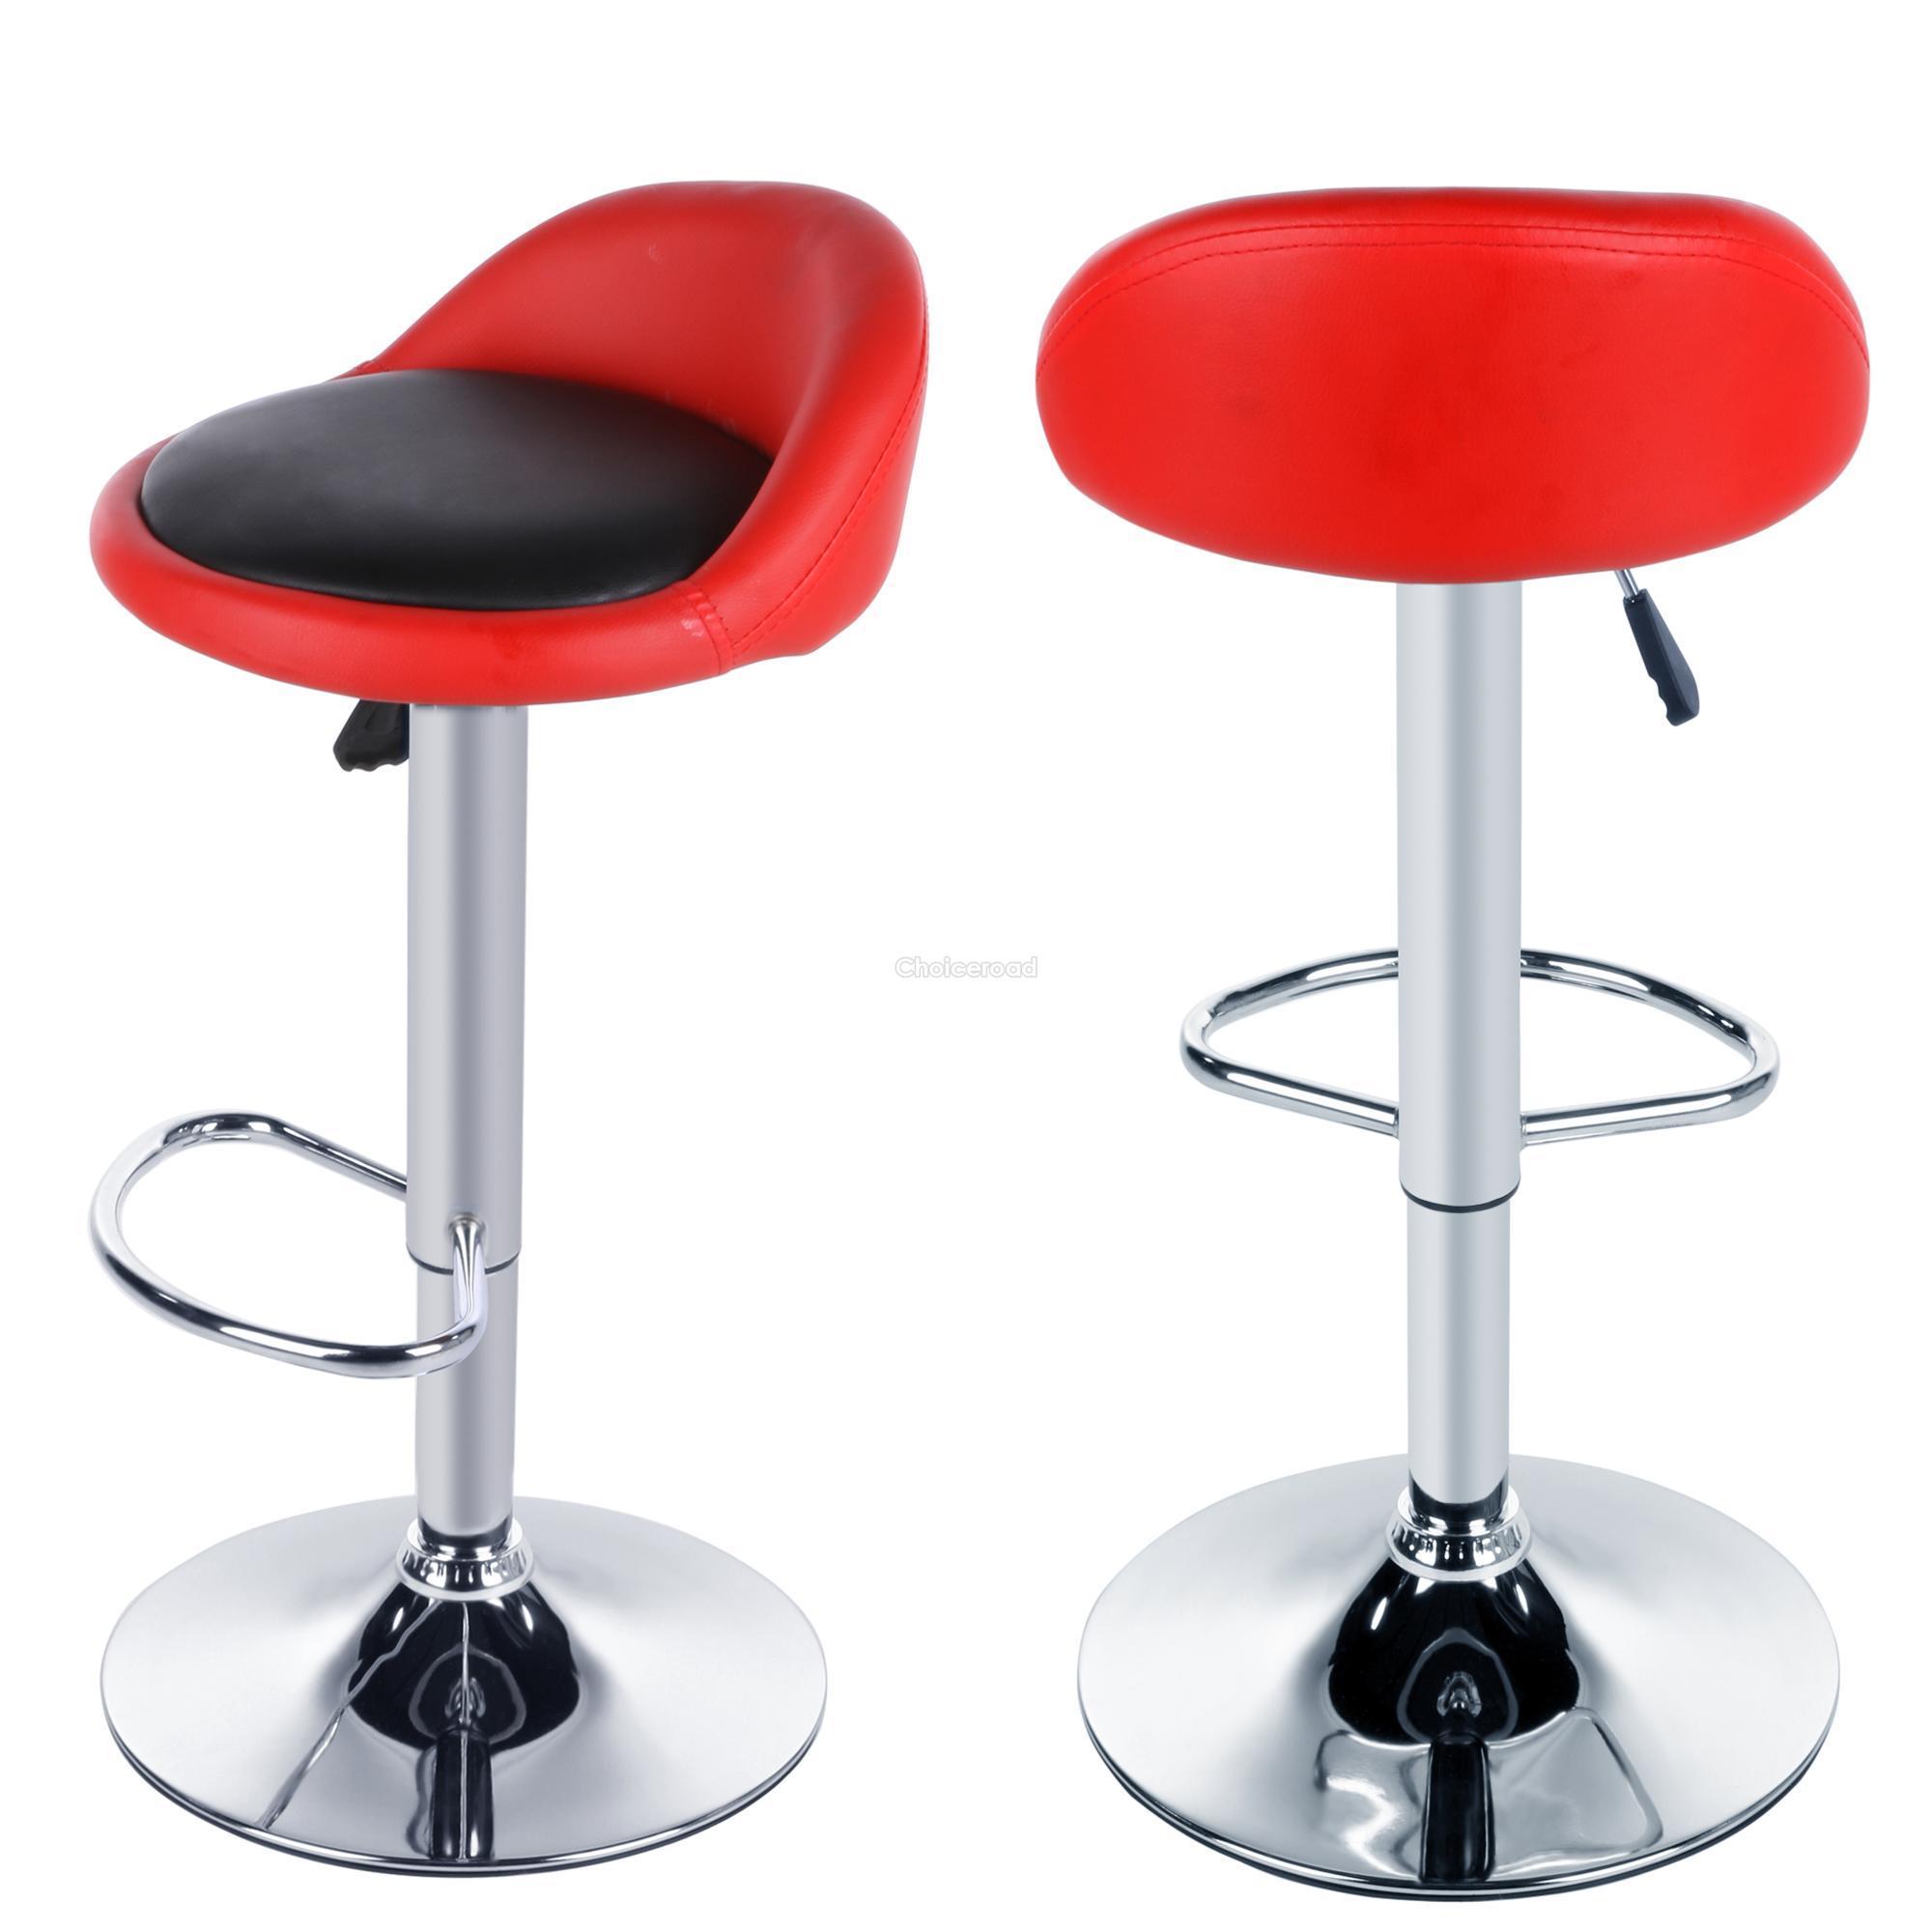 revolving chair bar stool folding dream meaning homdox 2x adjustable height rotating dinning